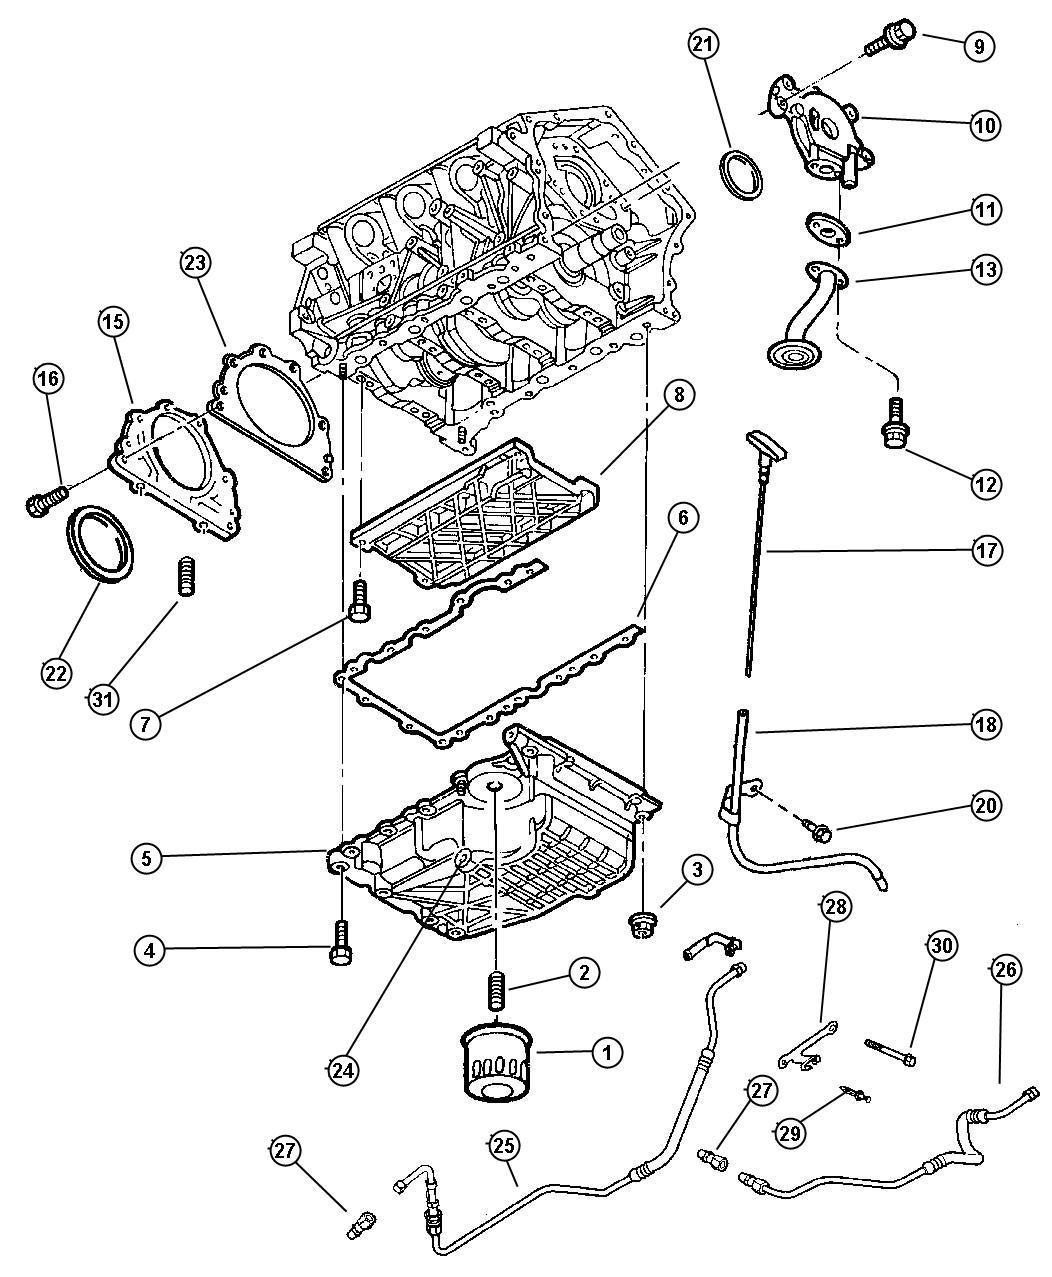 Dodge 2 7 Liter Engine Diagram